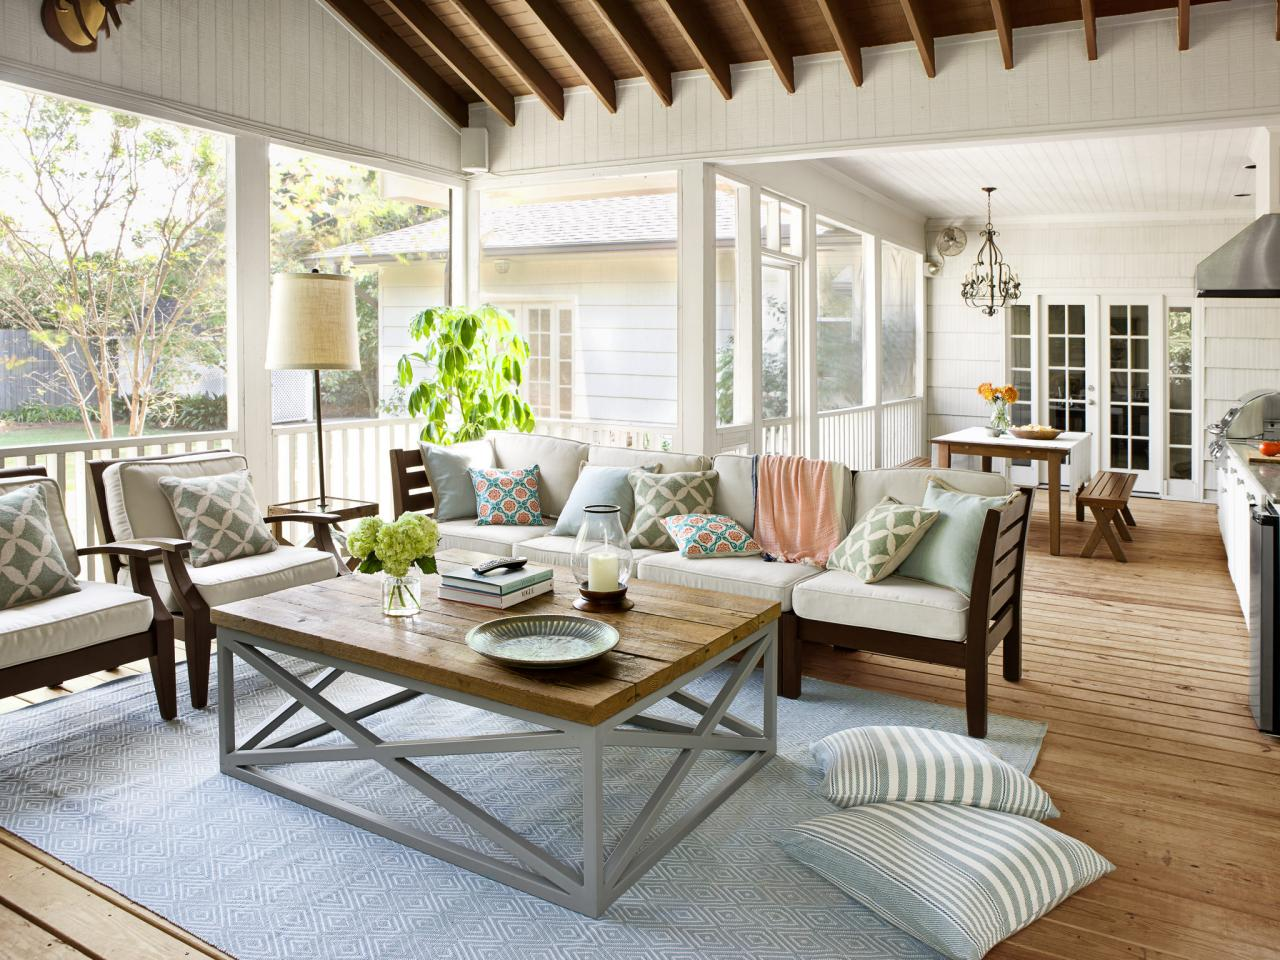 explore outdoor kitchen and threeseason roomoutdoor spaces